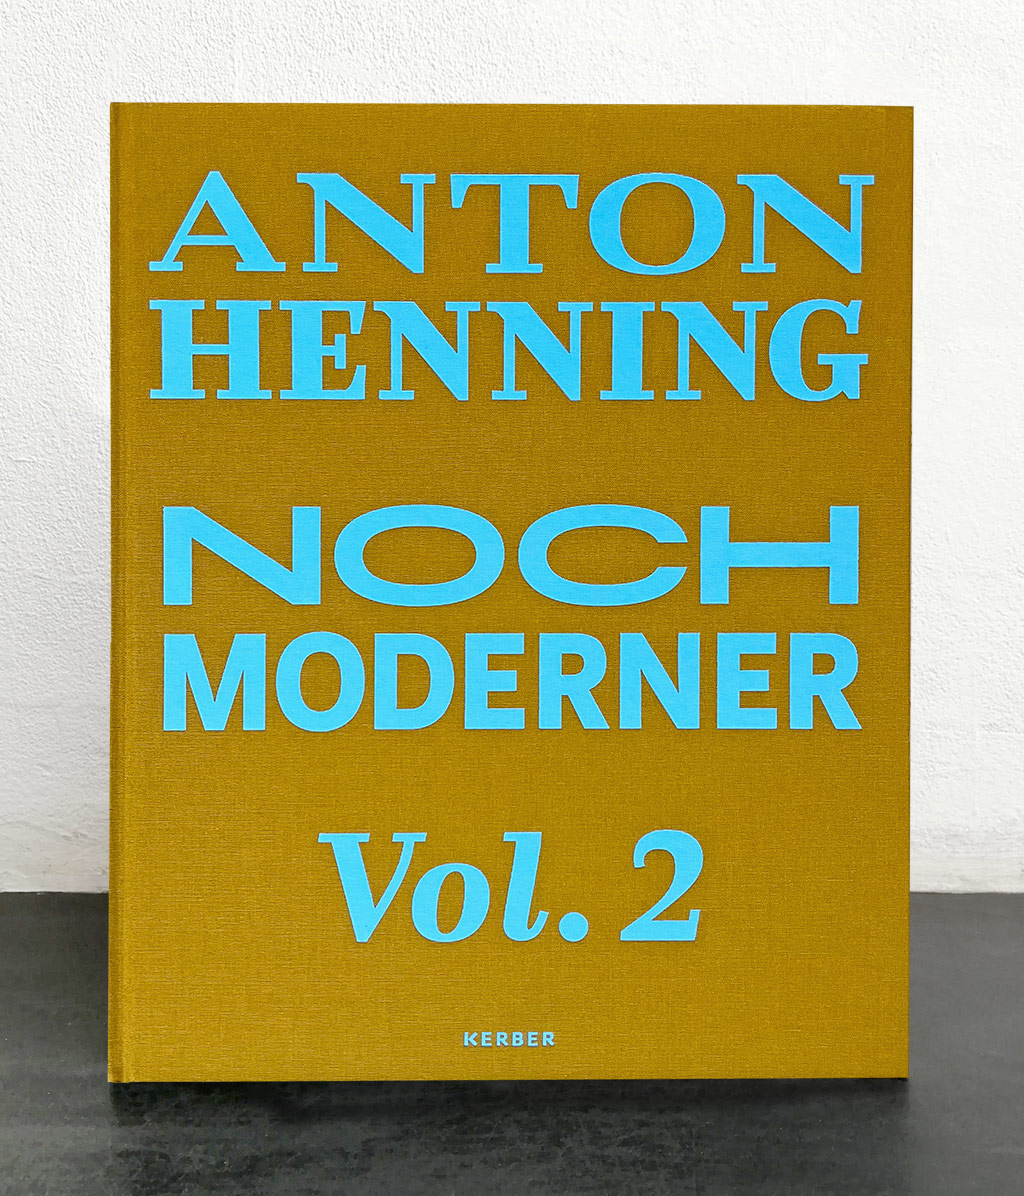 ANTON HENNING VOL. 2